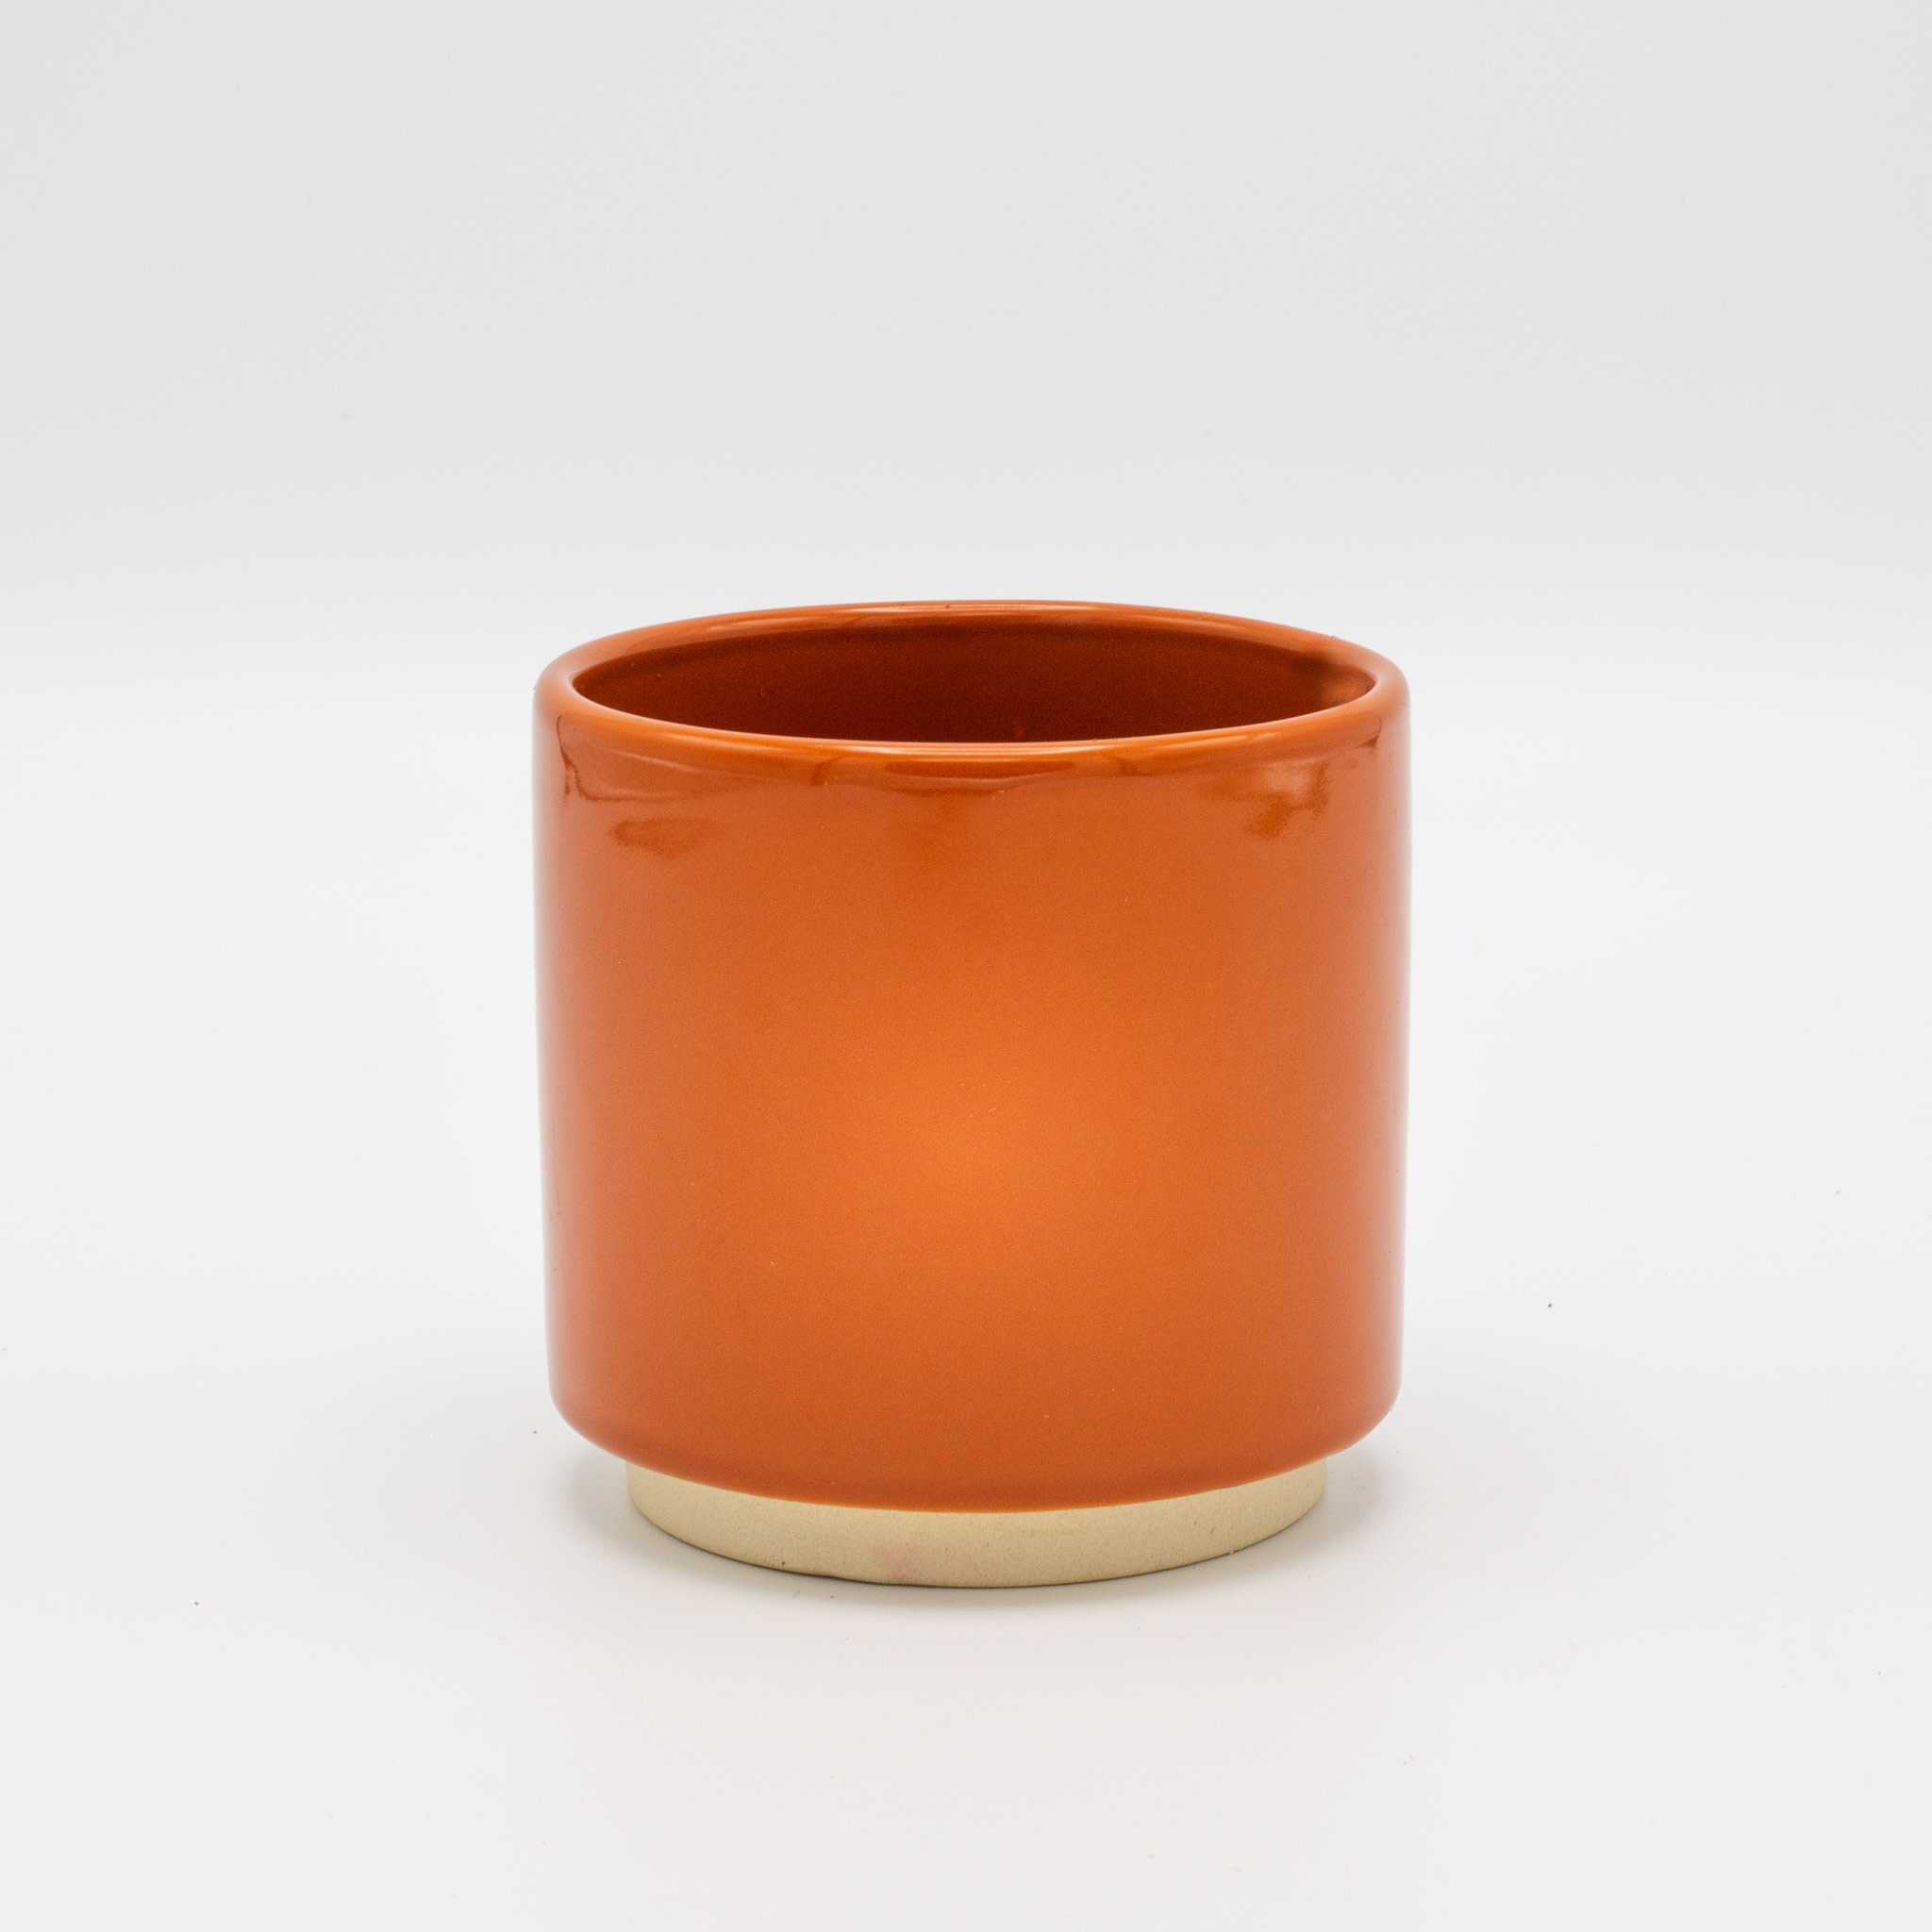 Bloempot Terracotta - Large-1